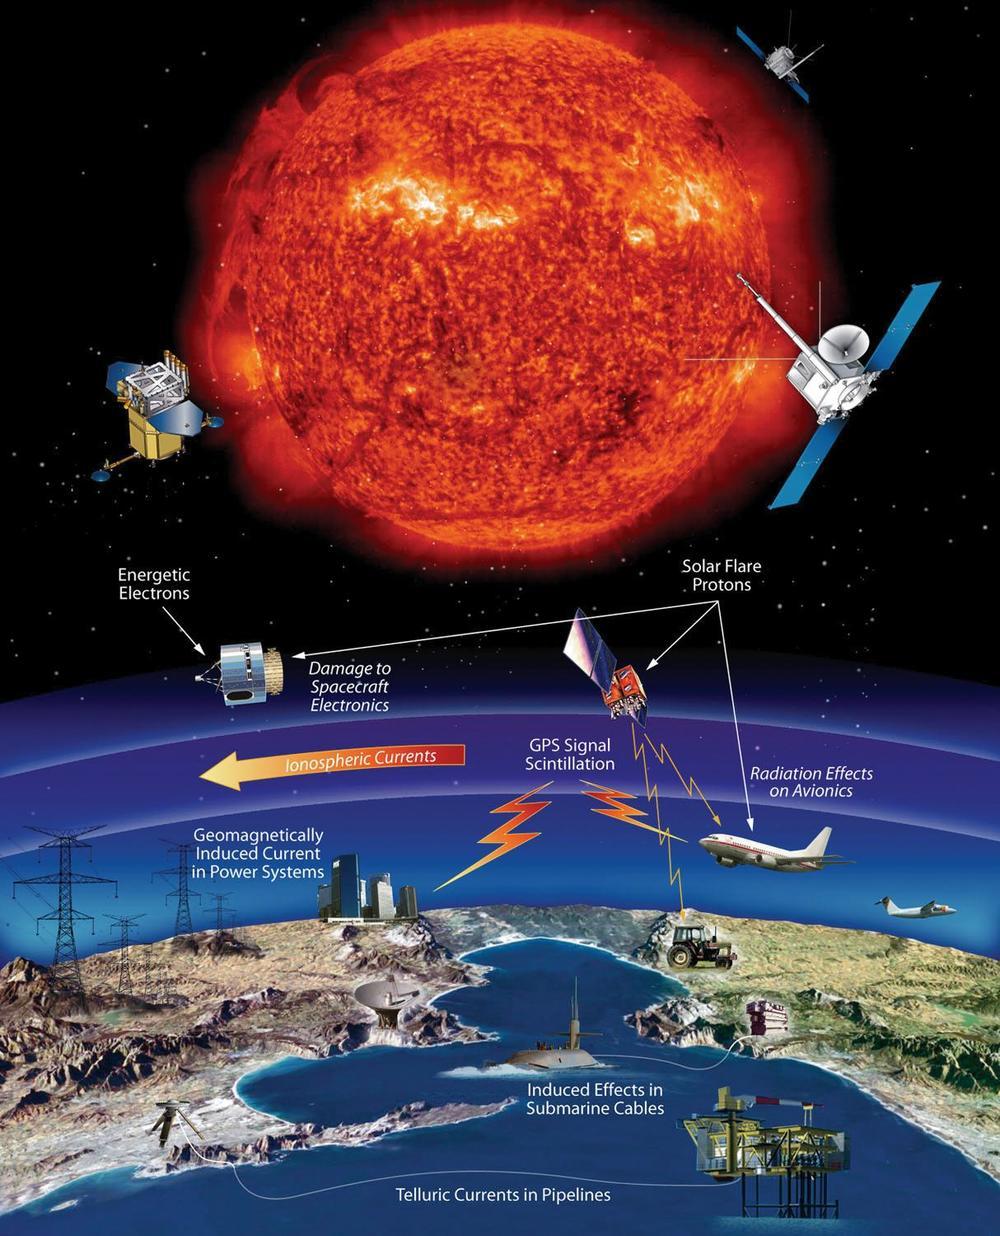 Source: NASA.gov